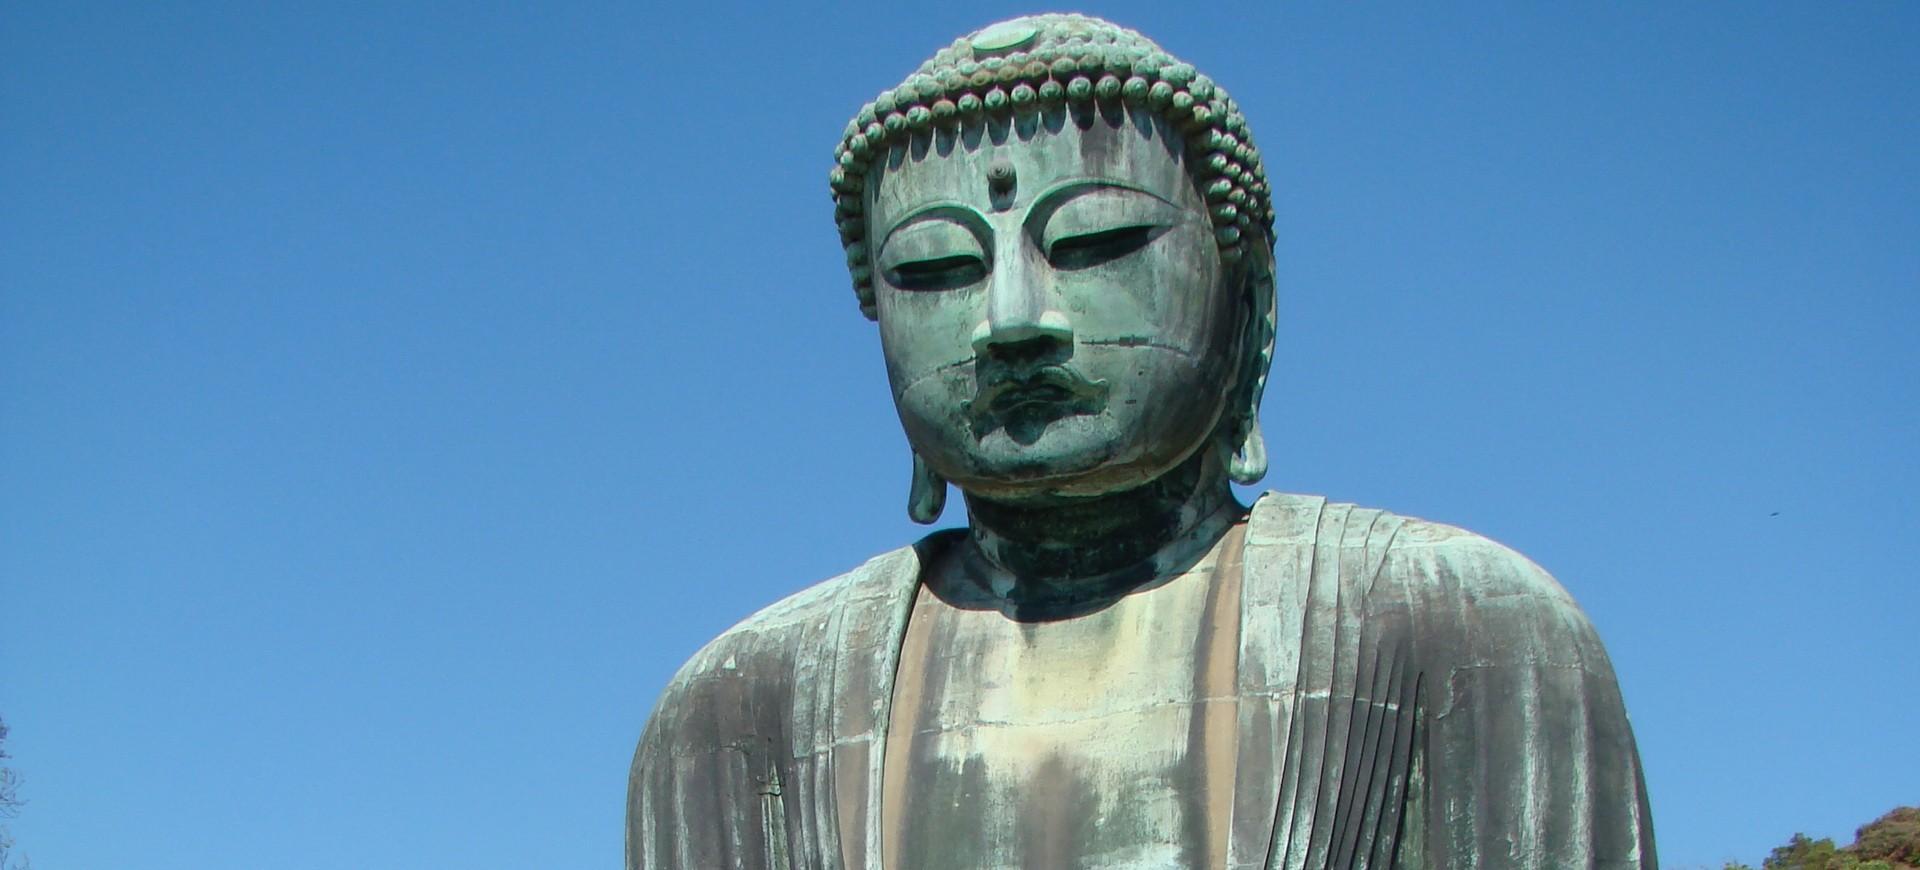 Japon Kamakura Bouddha Géan